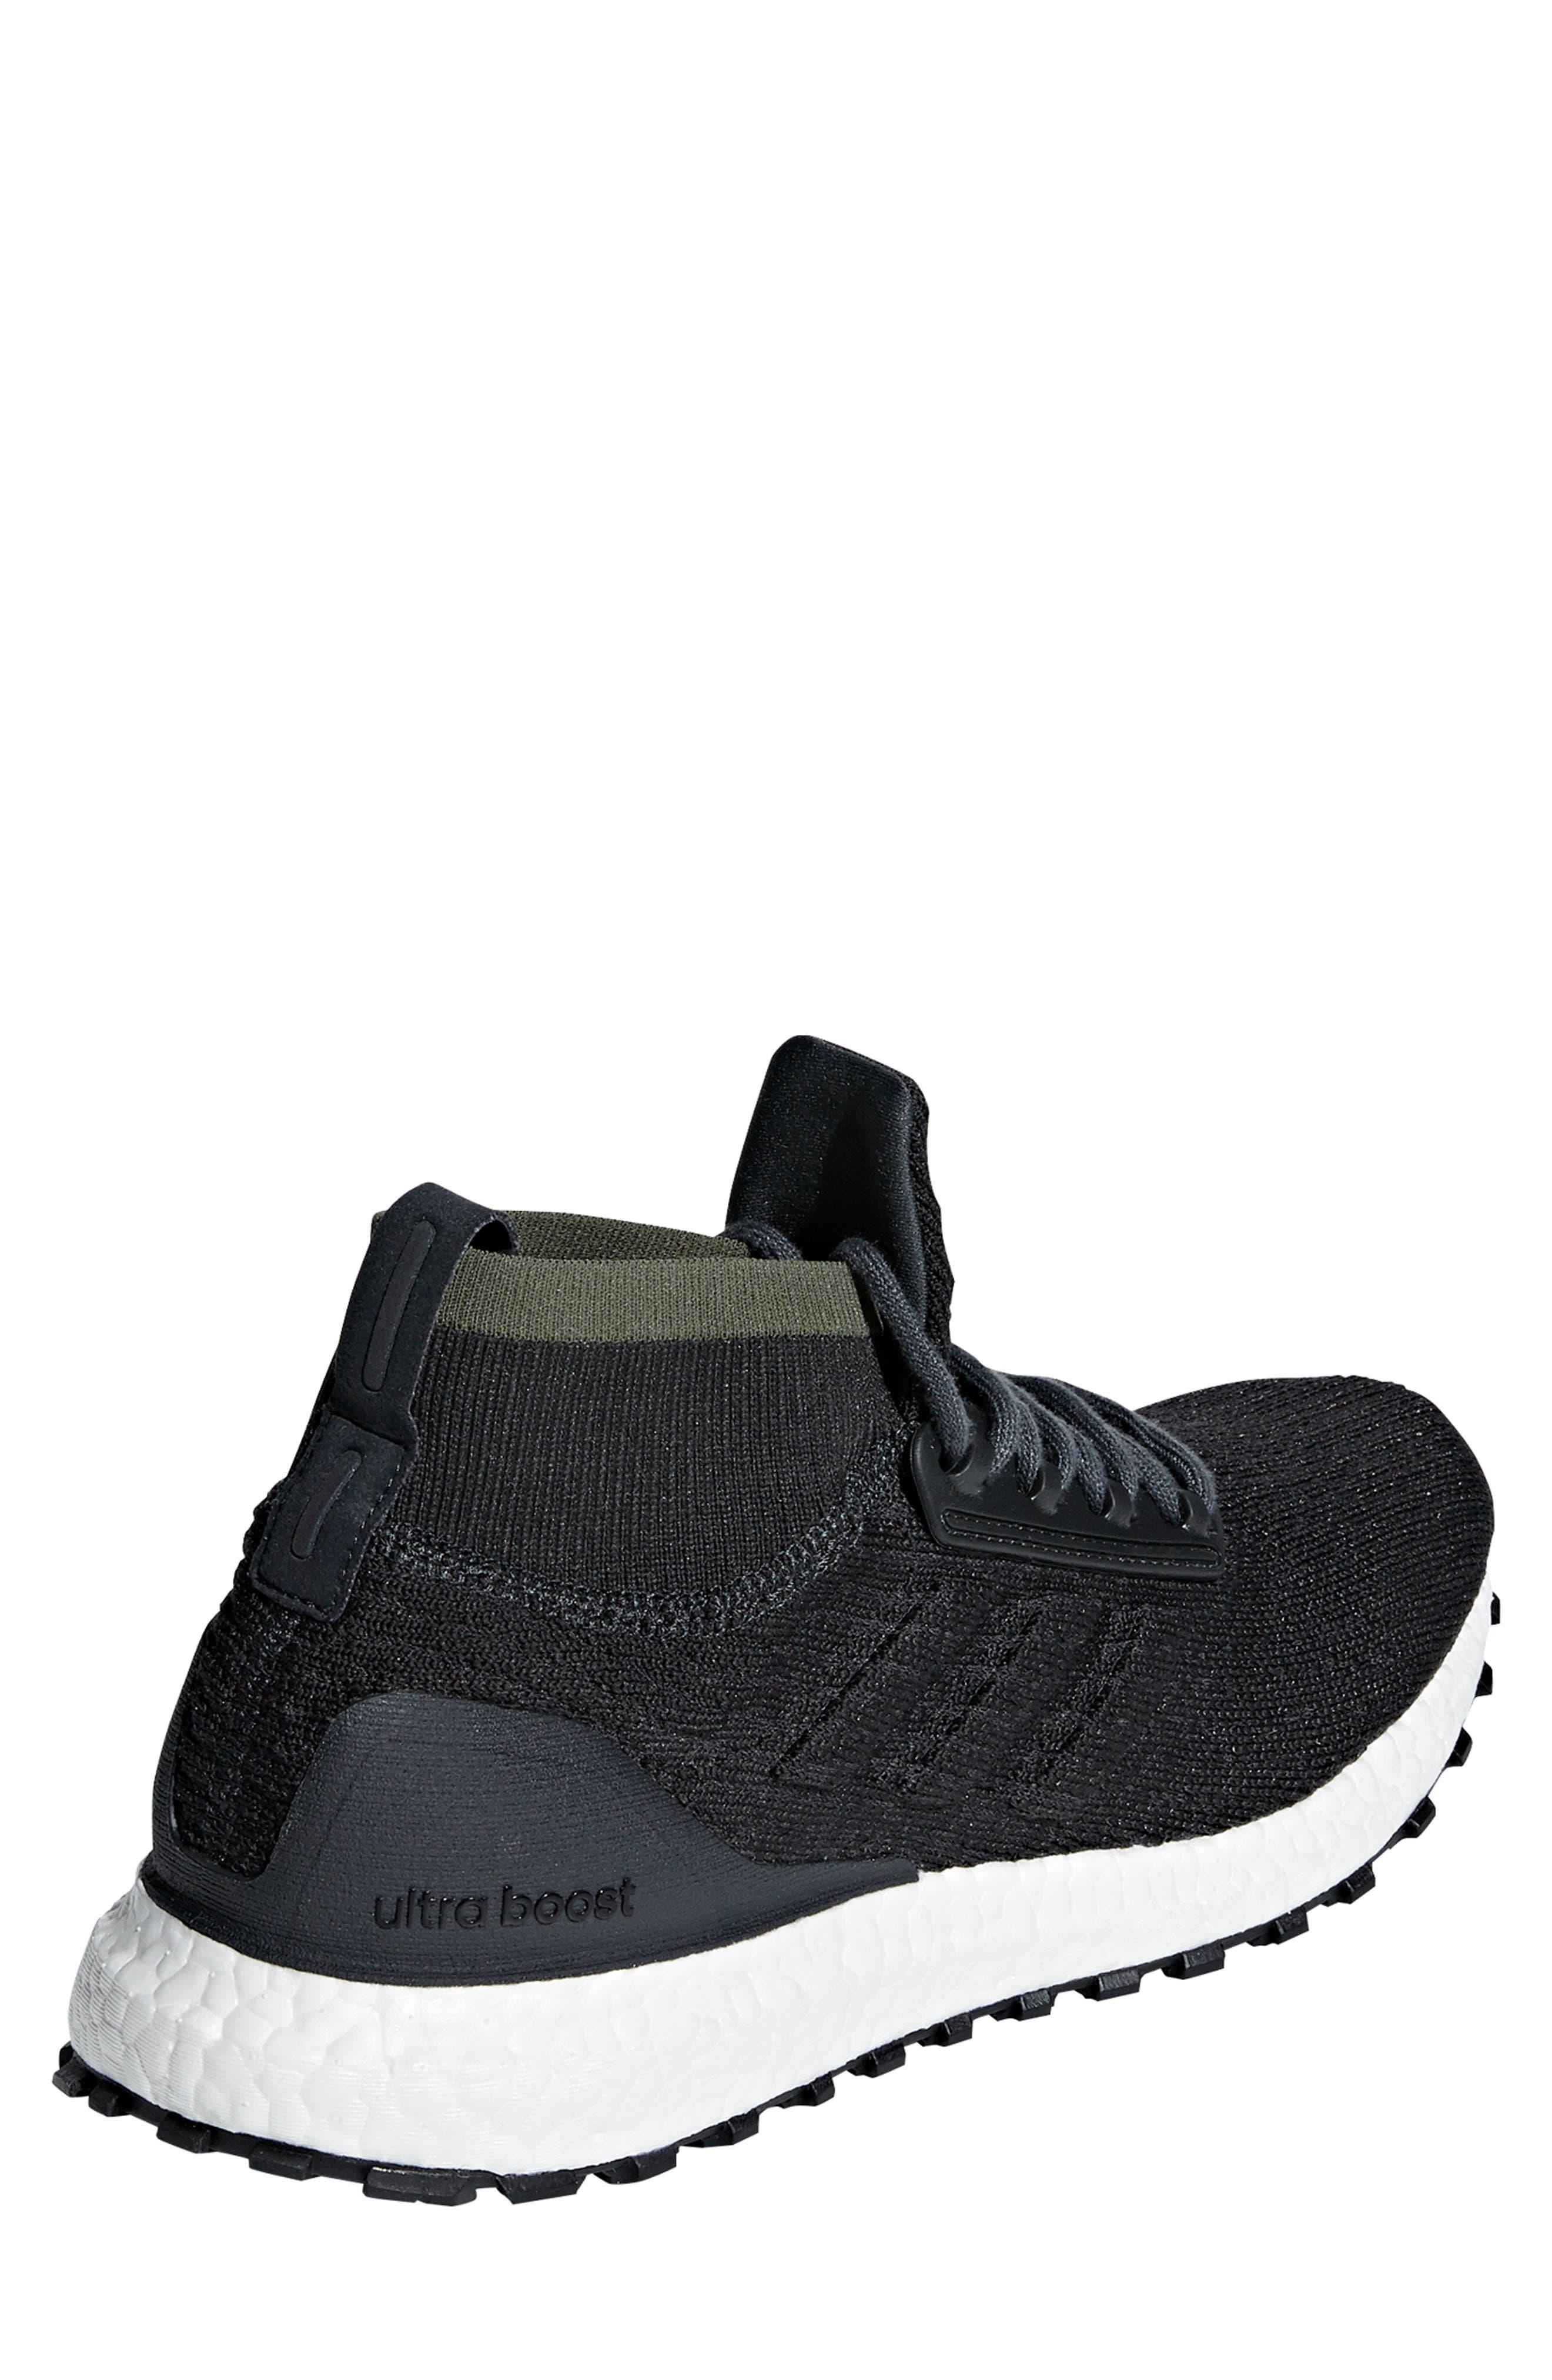 UltraBoost All Terrain Water Resistant Running Shoe,                             Alternate thumbnail 2, color,                             CARBON / CORE BLACK / WHITE